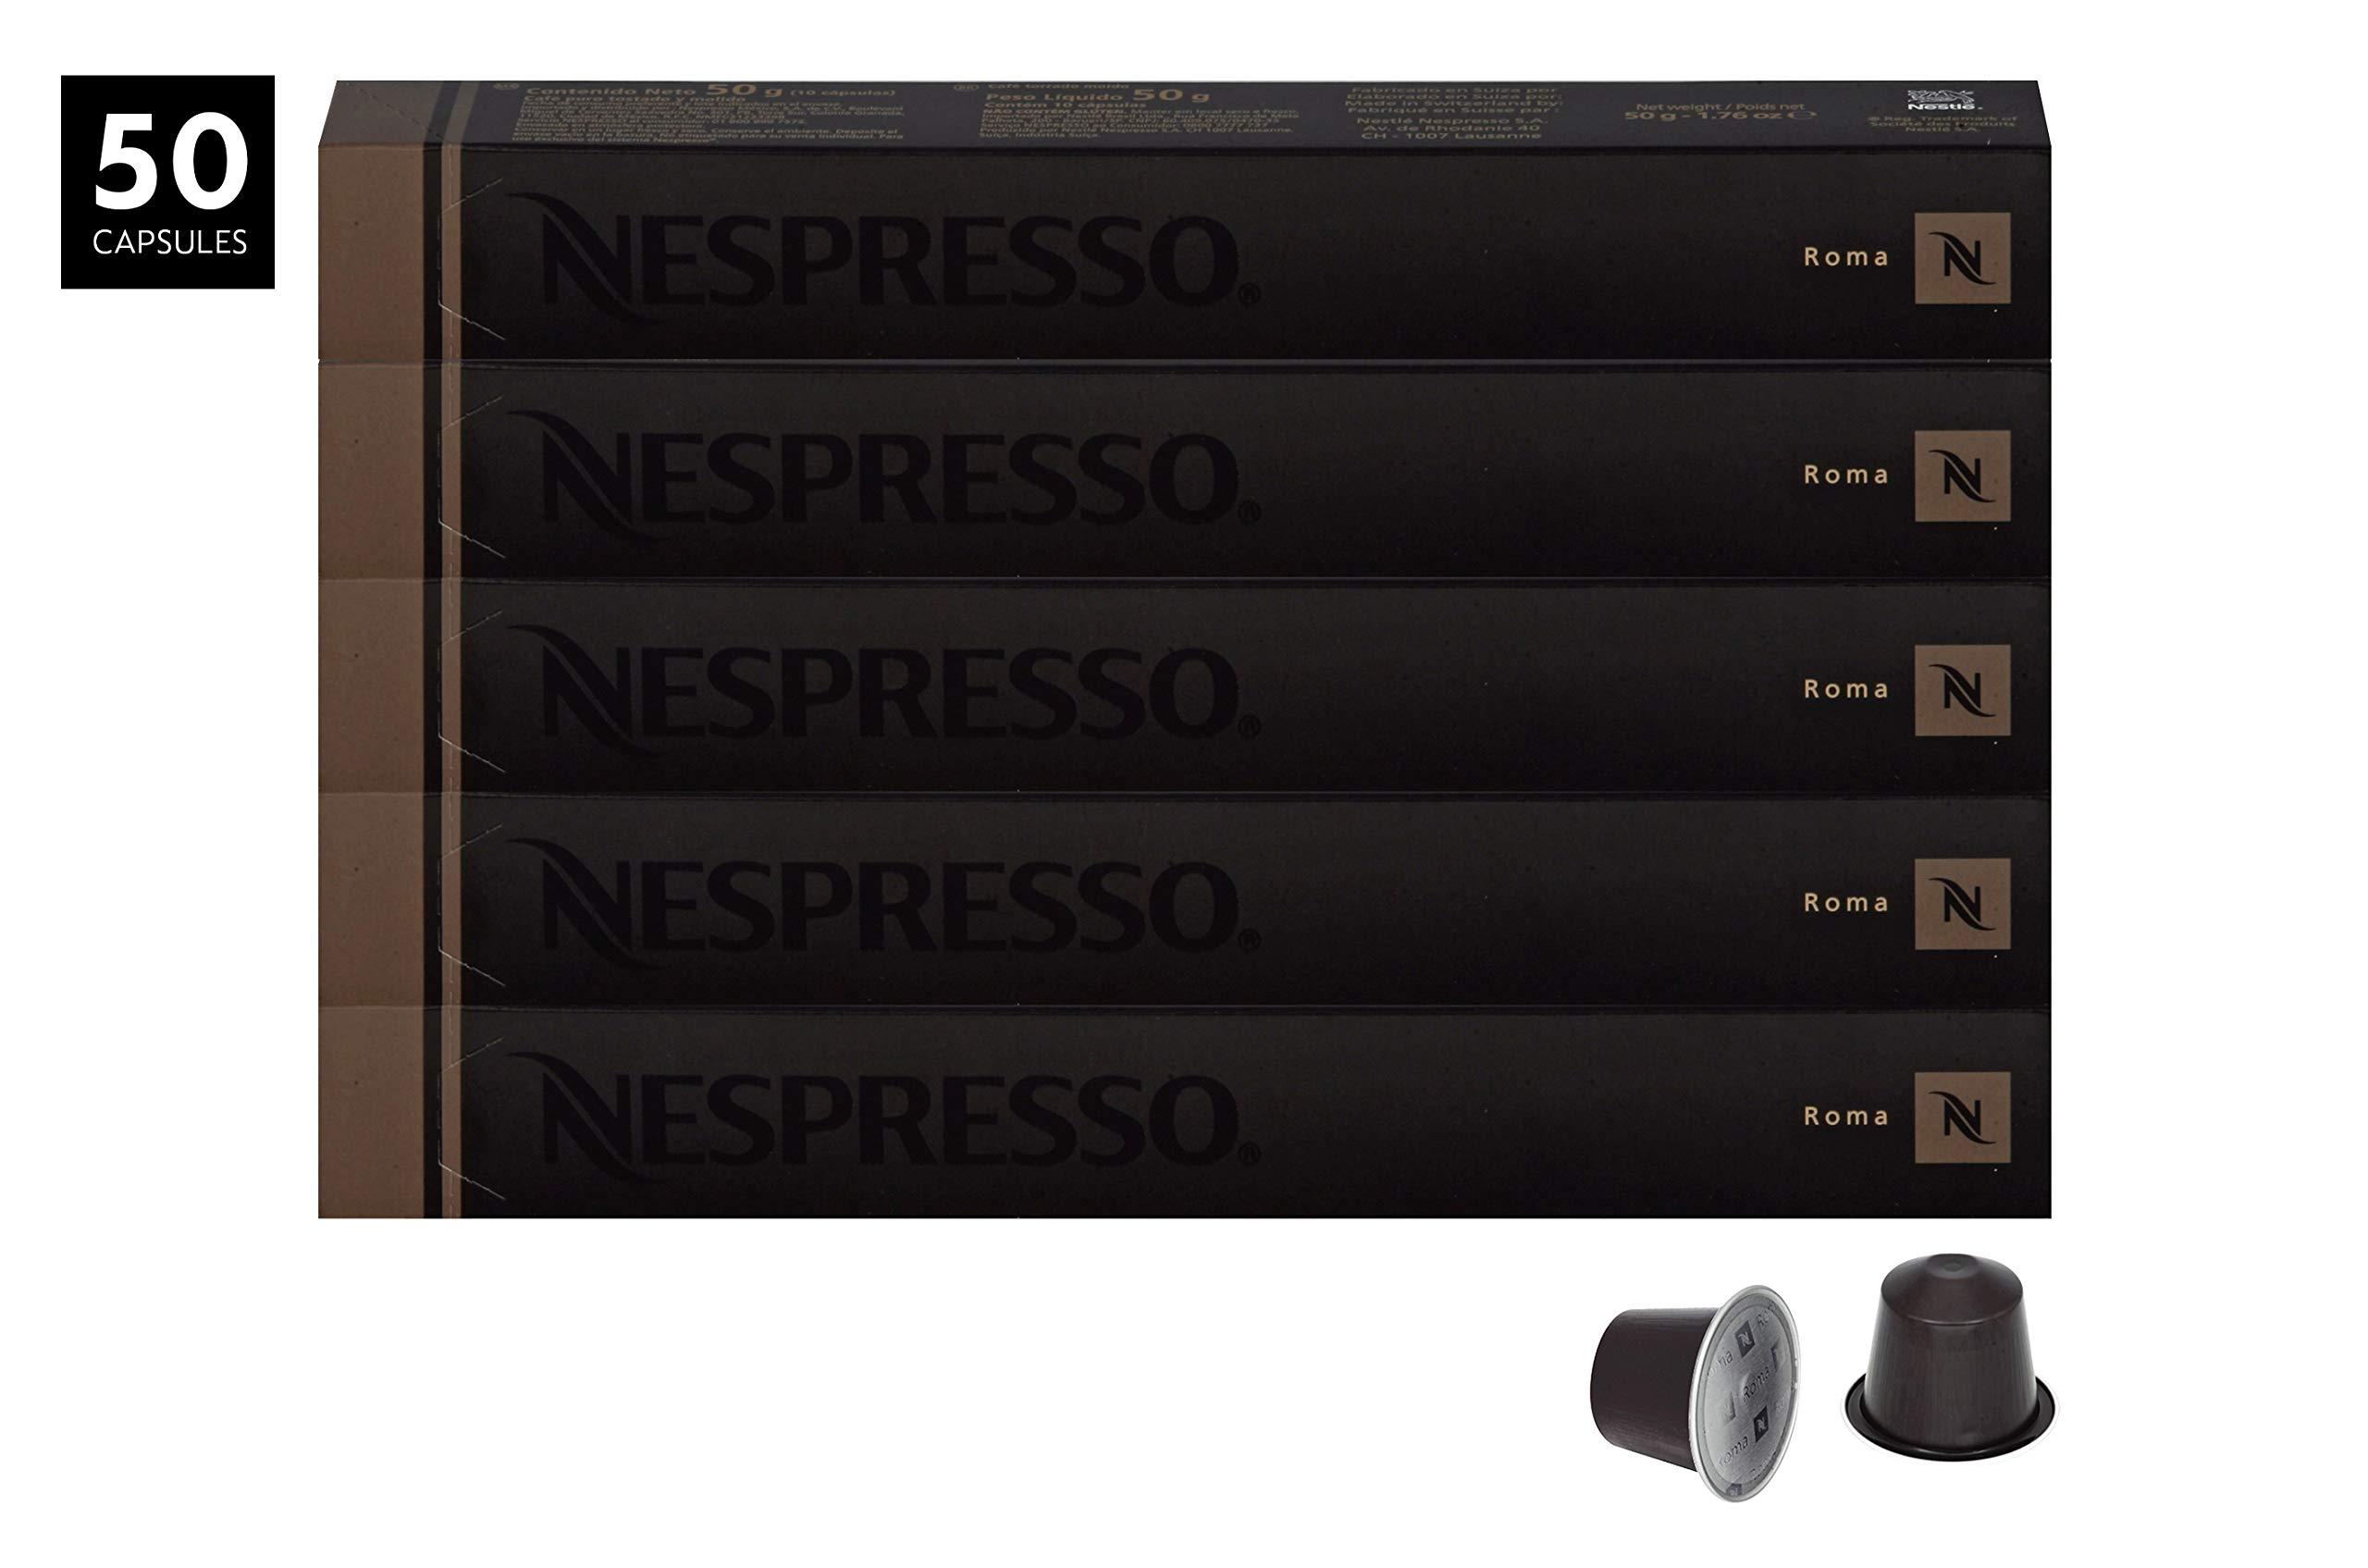 Nespresso OriginalLine Roma Capsules, 50 Count Espresso Pods, Light Roast Intensity 8 Blend, Central & South American Arabica with Robusta Coffee Flavors by Nespresso